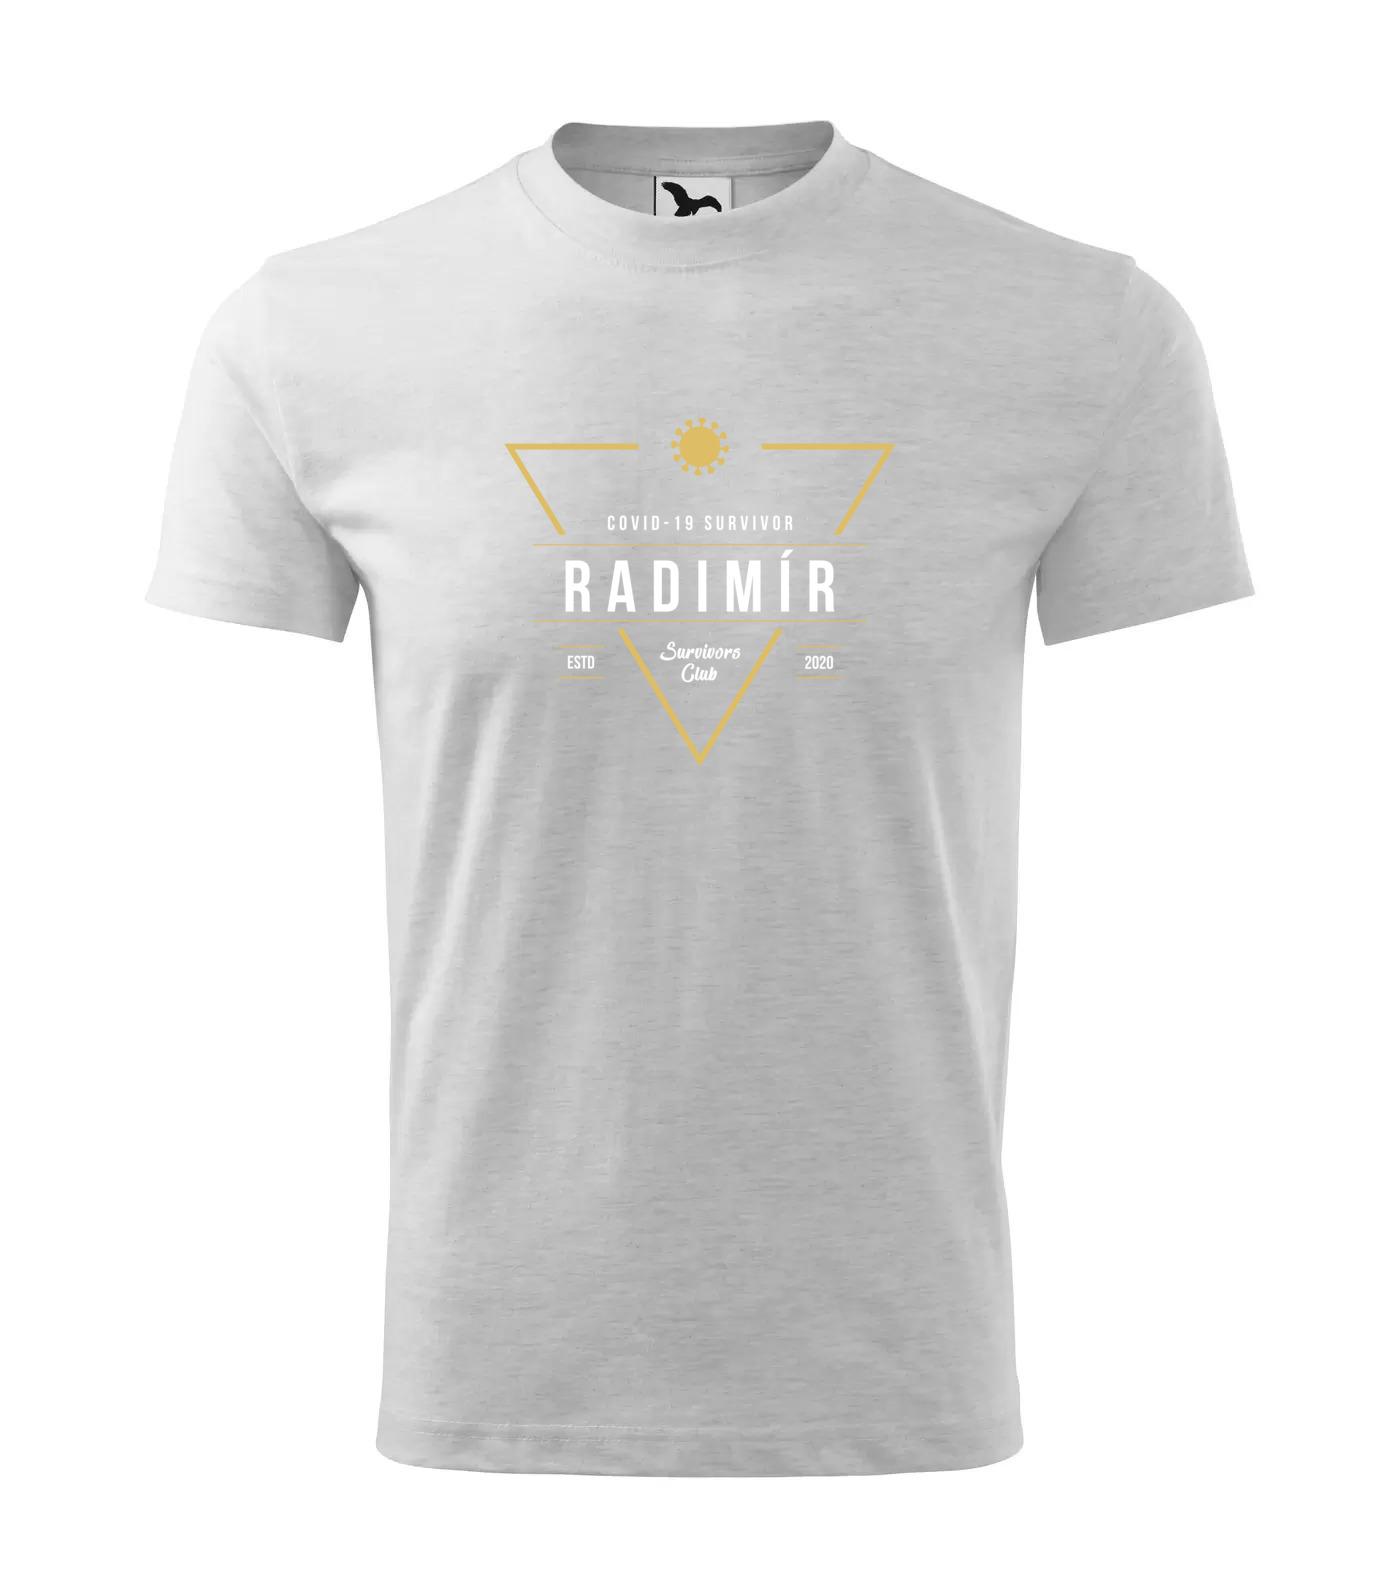 Tričko Survivor Club Radimír